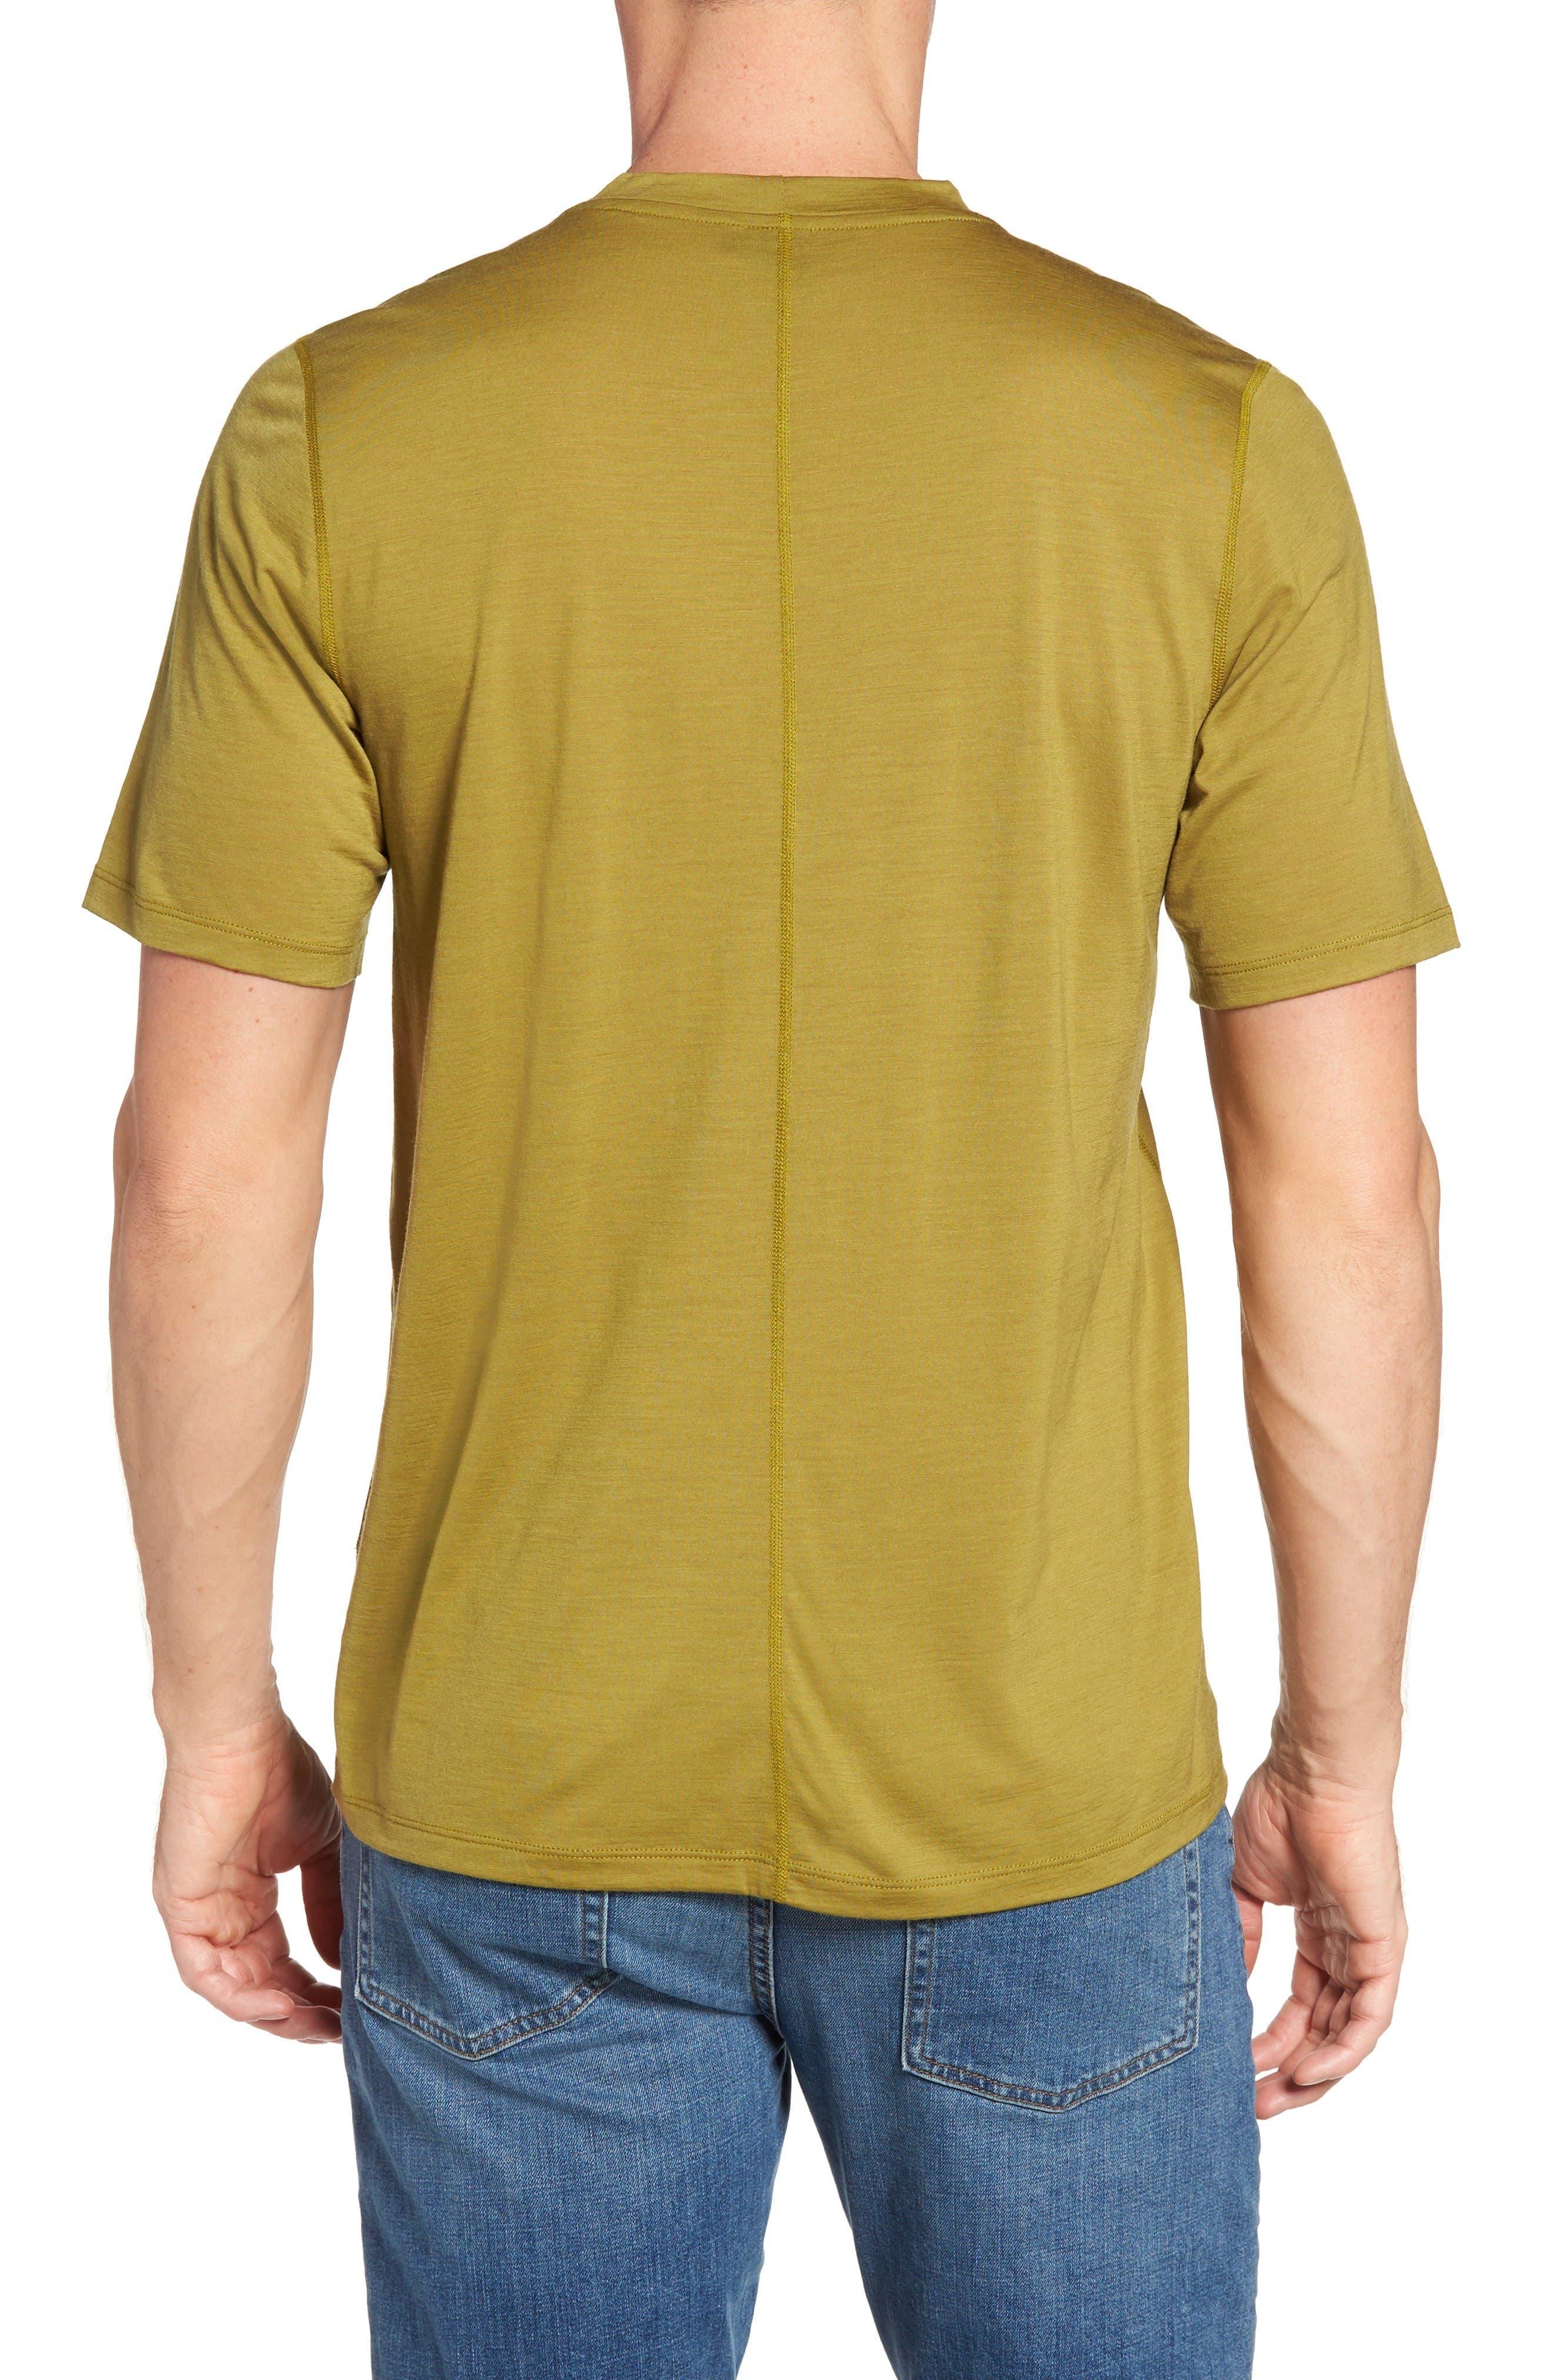 Alternate Image 2  - ibex 'All Day Weightless Wool Blend' T-Shirt